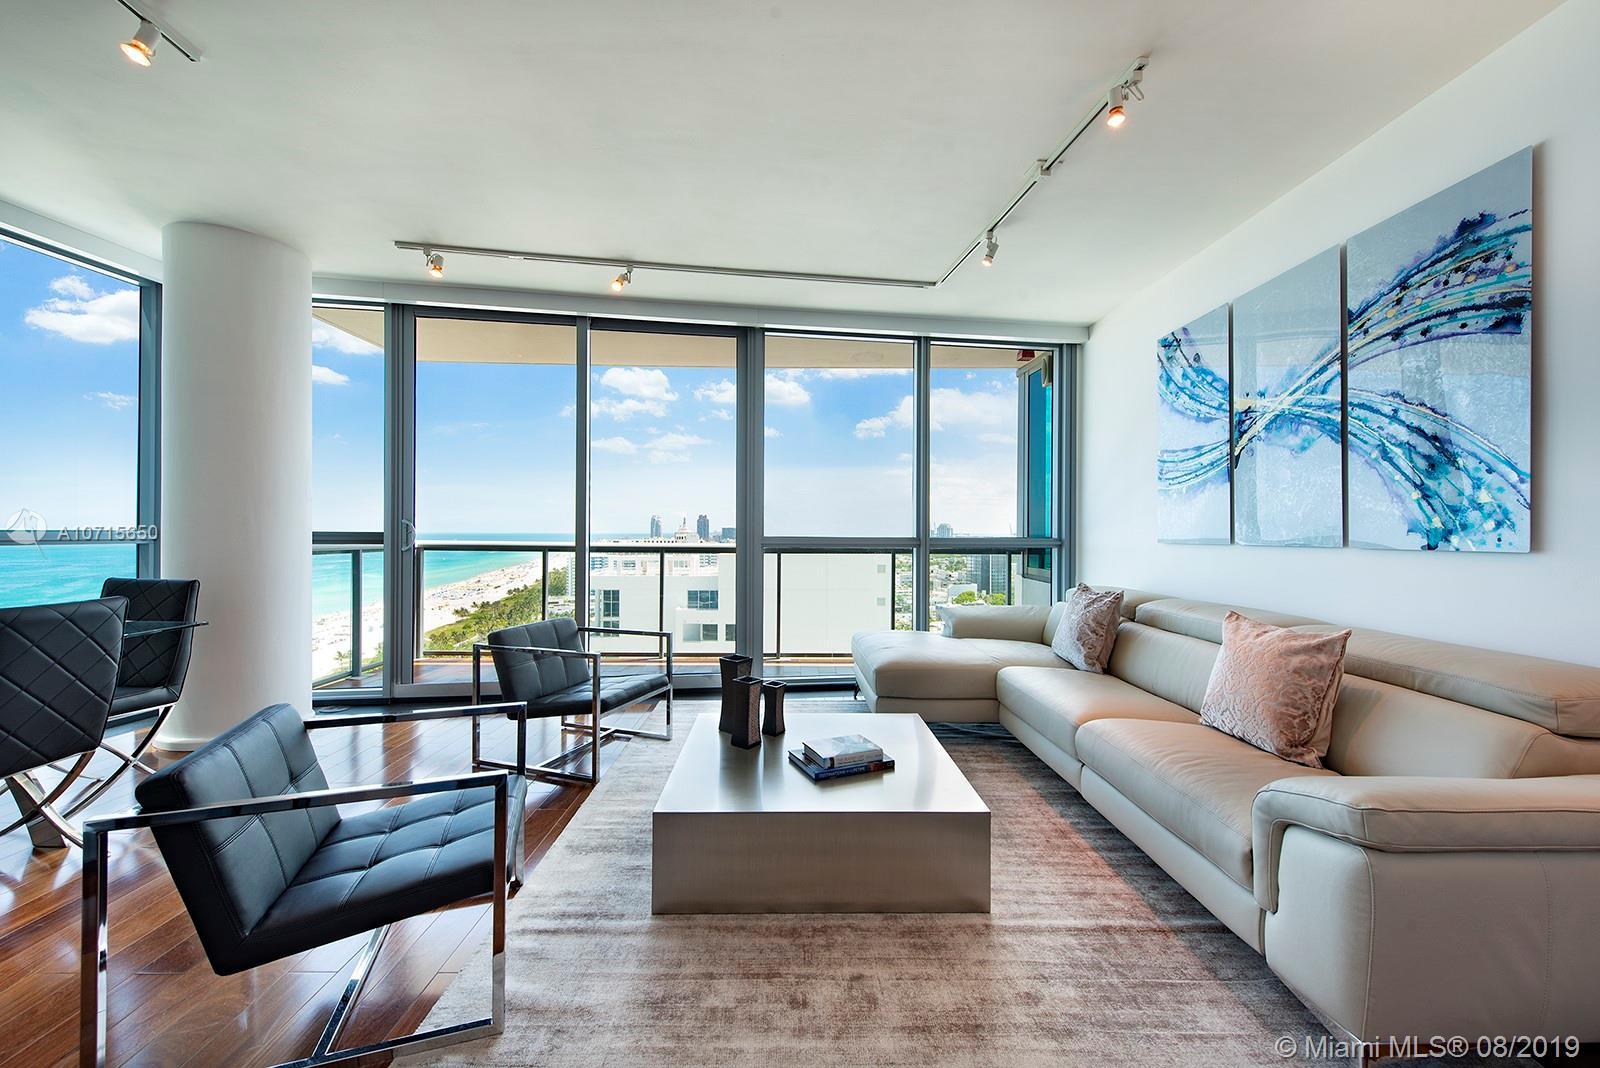 101 20th St, 2704 - Miami Beach, Florida